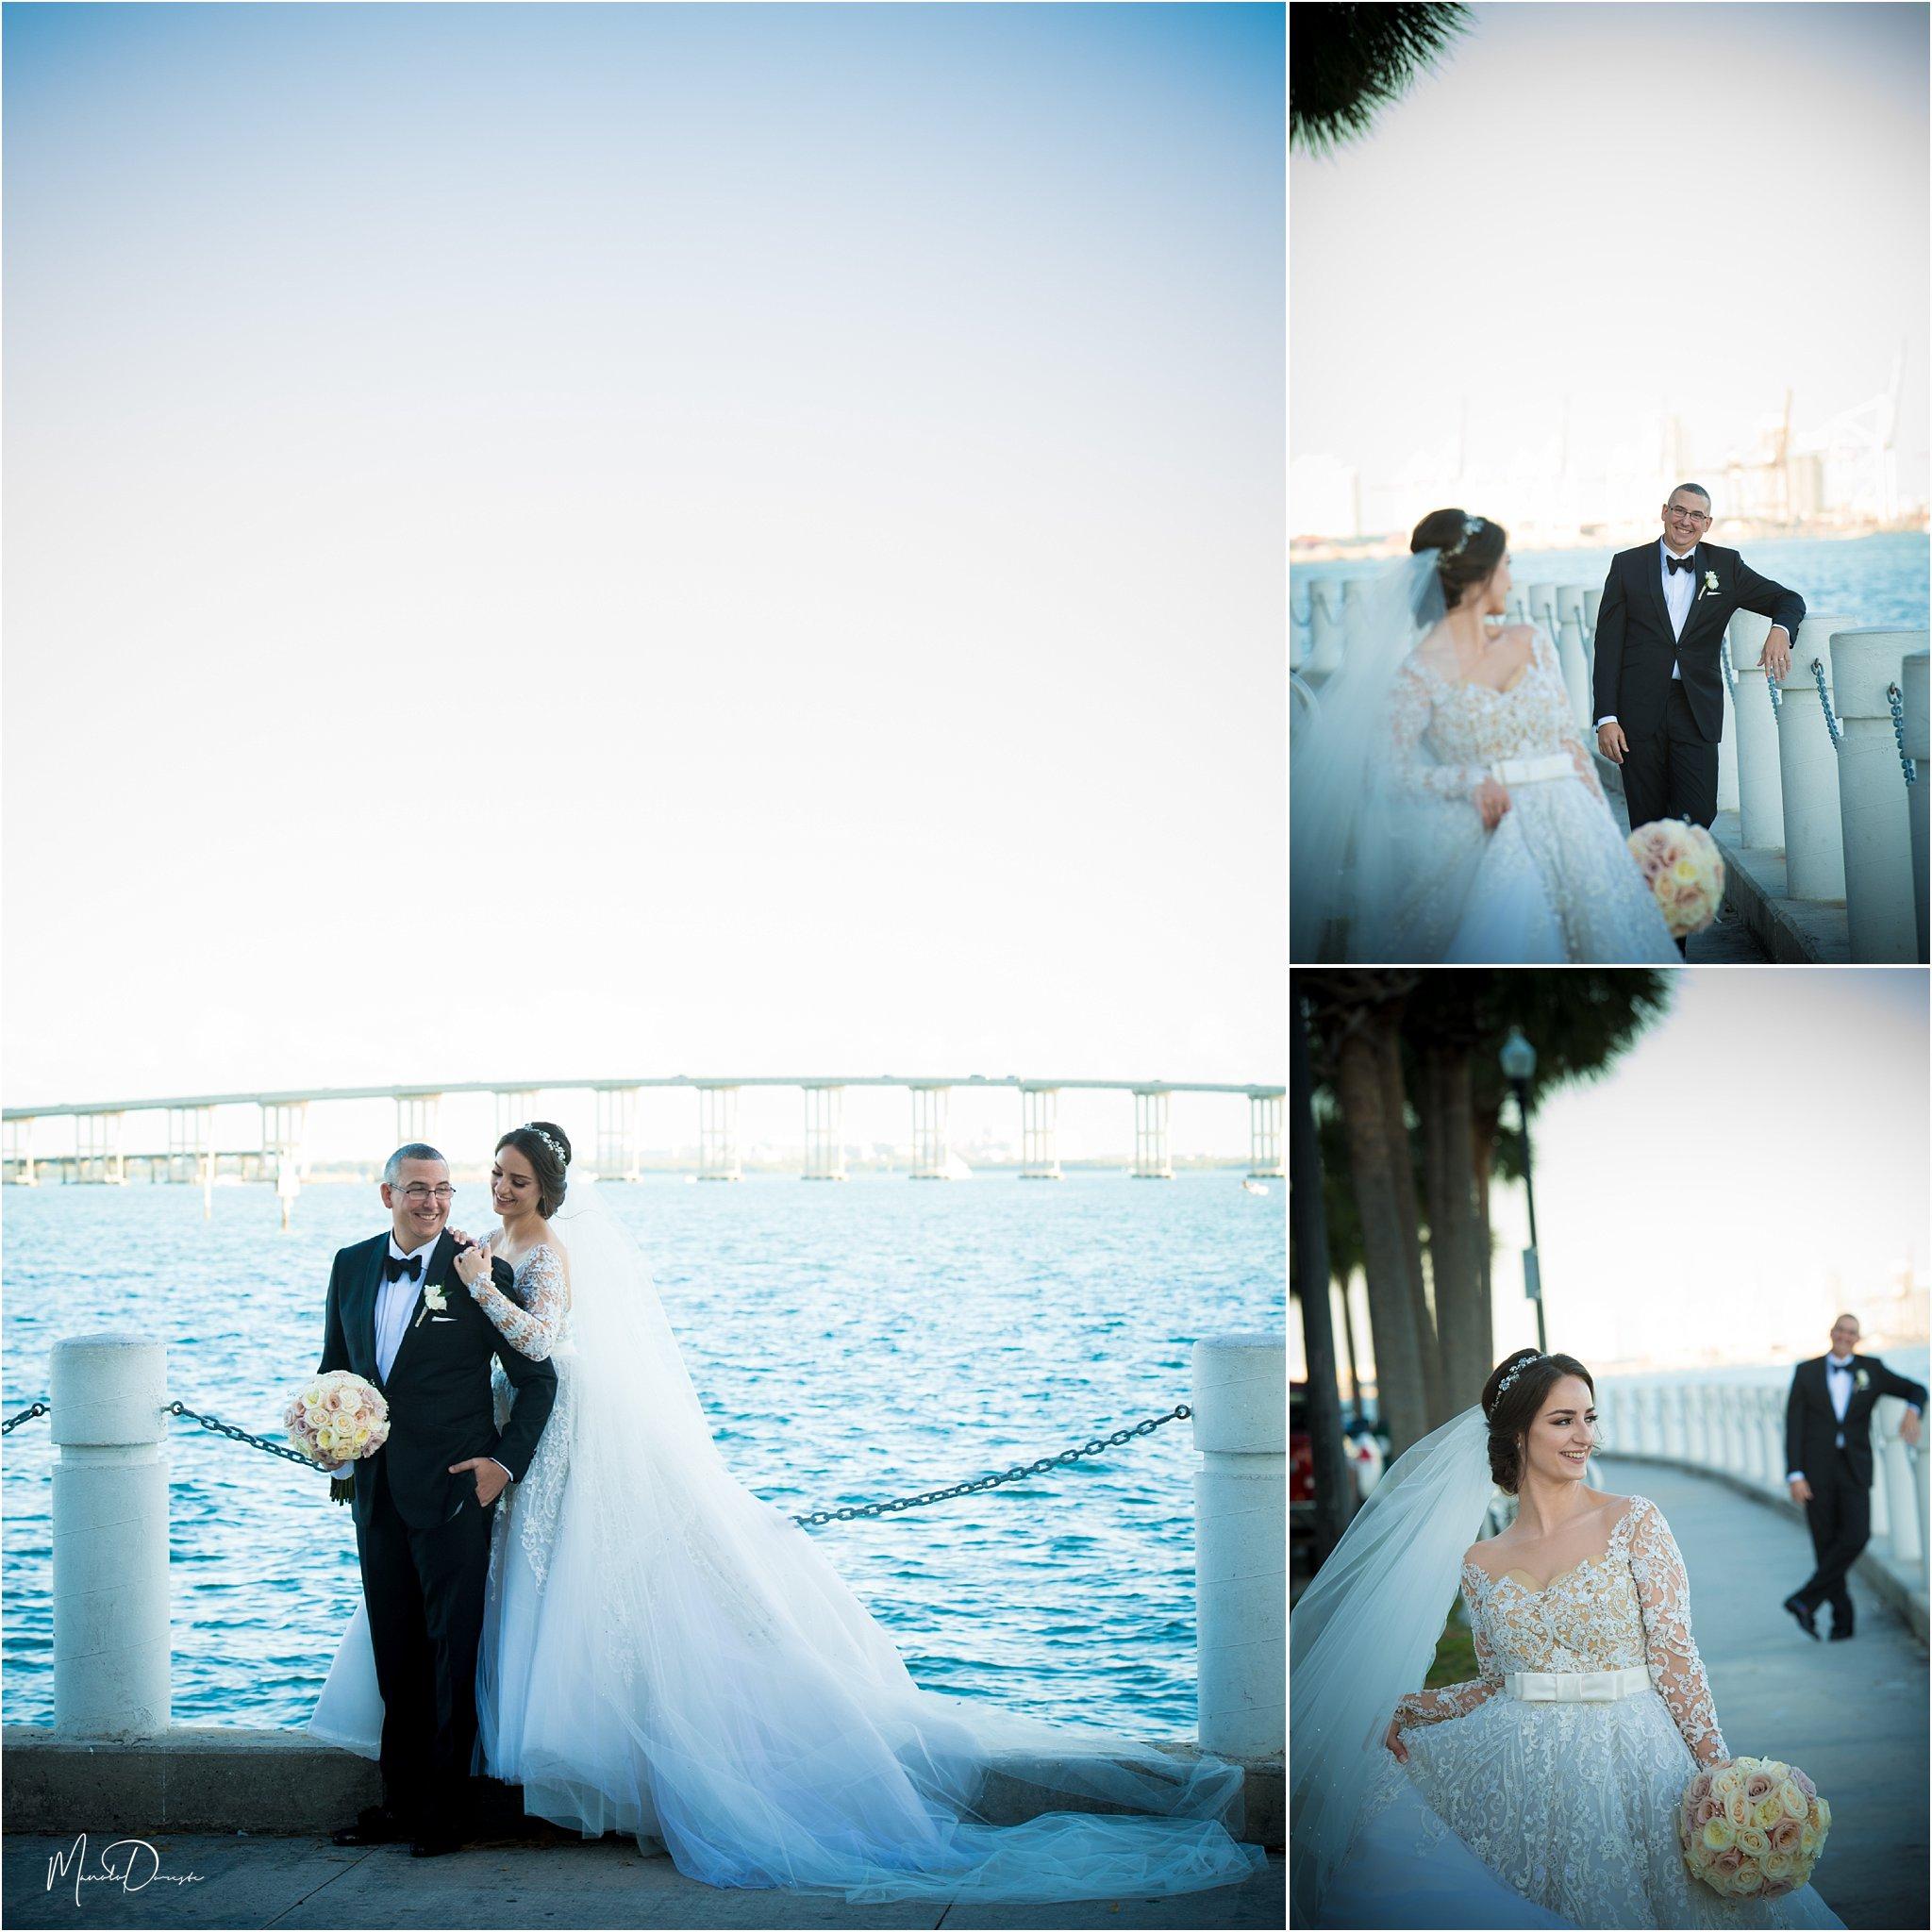 00727_ManoloDoreste_InFocusStudios_Wedding_Family_Photography_Miami_MiamiPhotographer.jpg